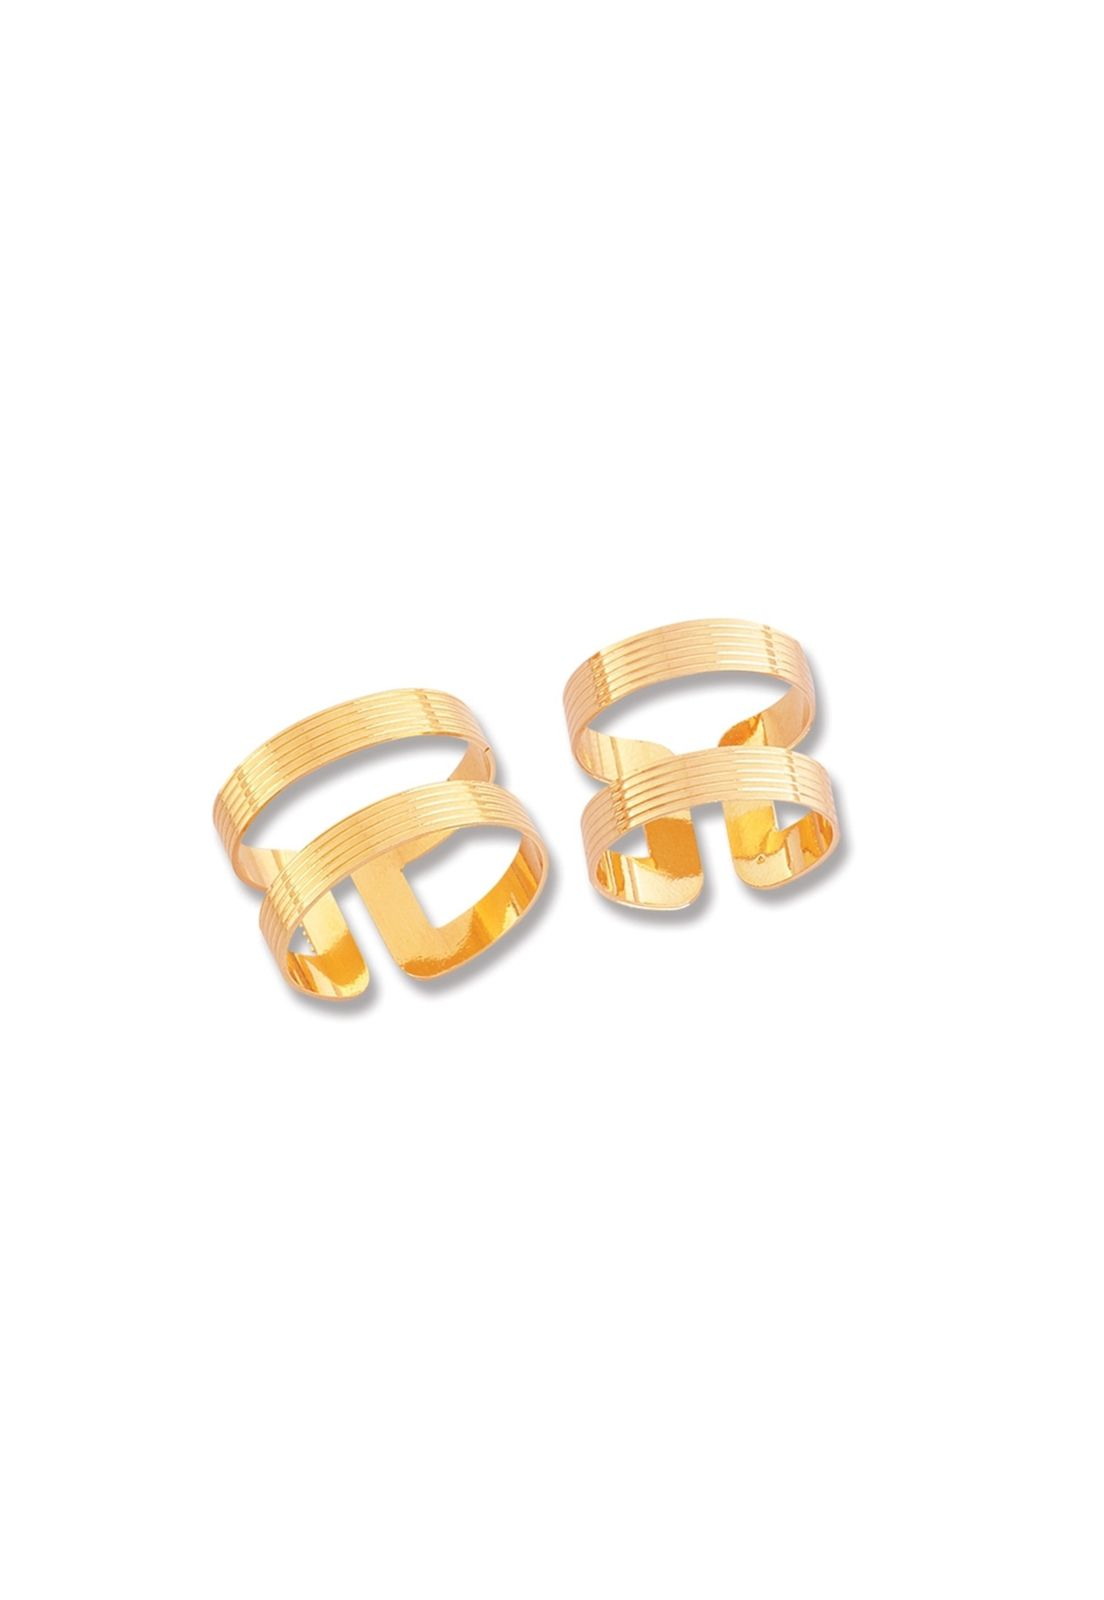 Anel Le Diamond Chapa Aro Duplo Dourado